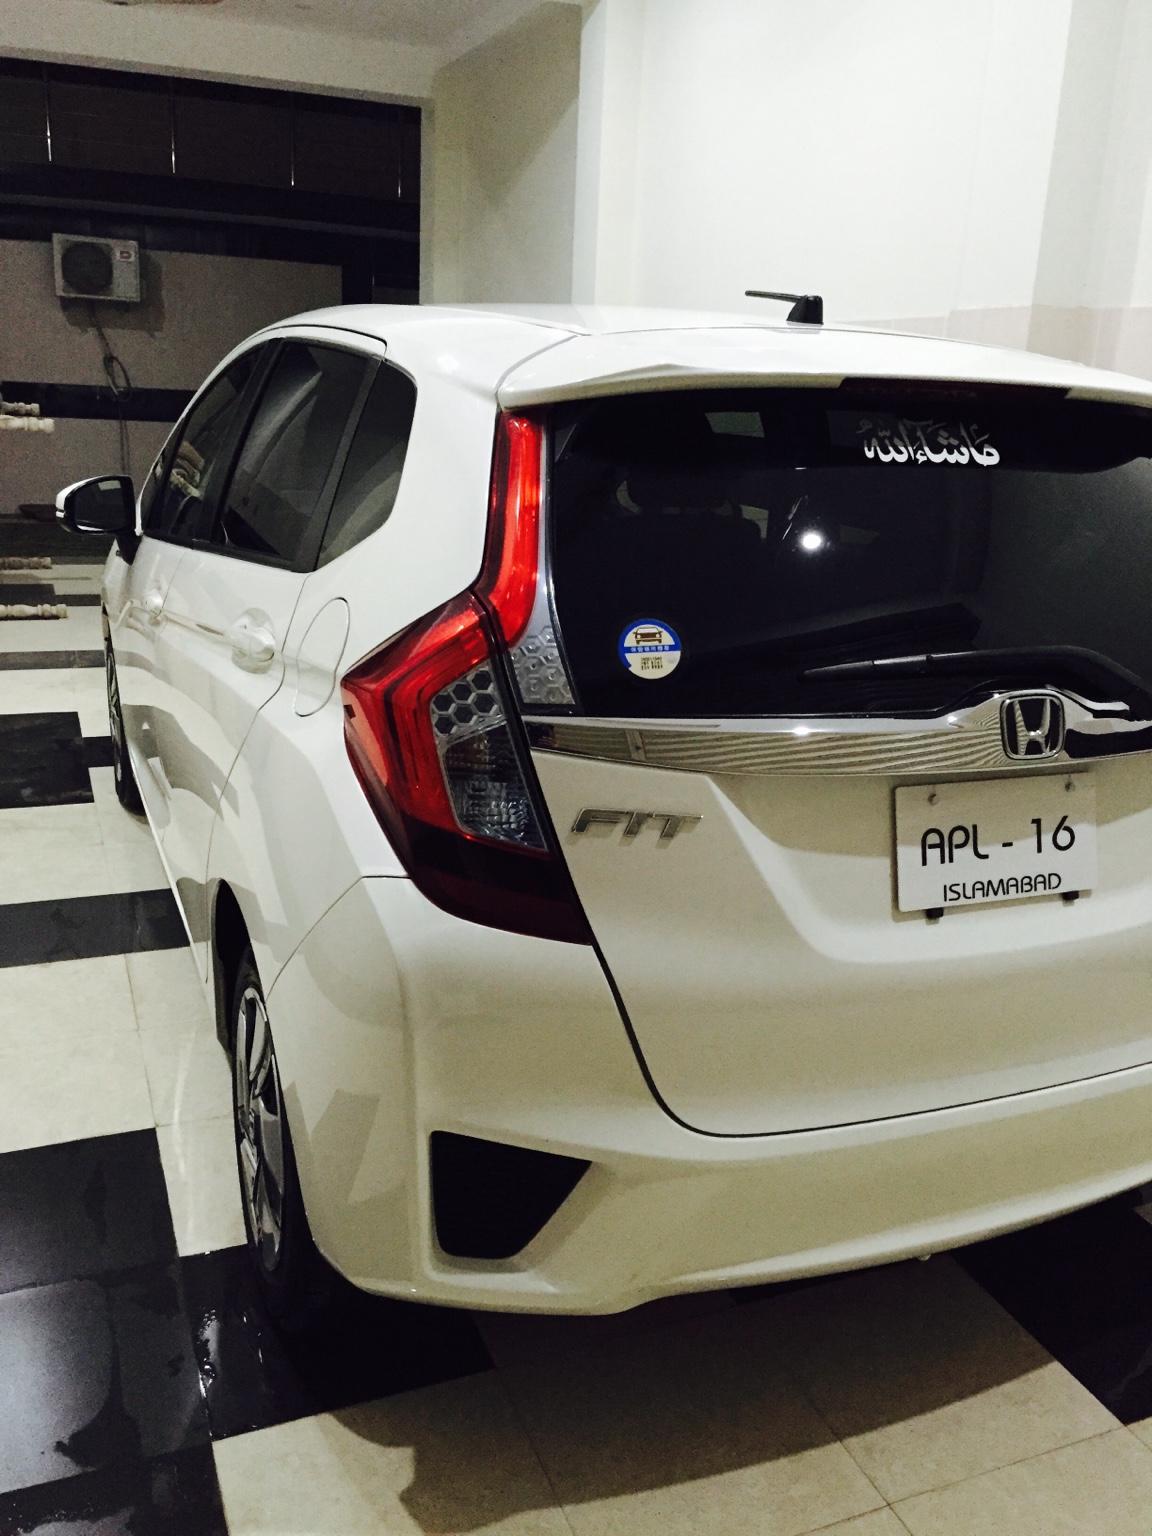 Honda Fit Hybrid Owners and Fans Club - e5e977bdba102a6144bd9a318d9cb781